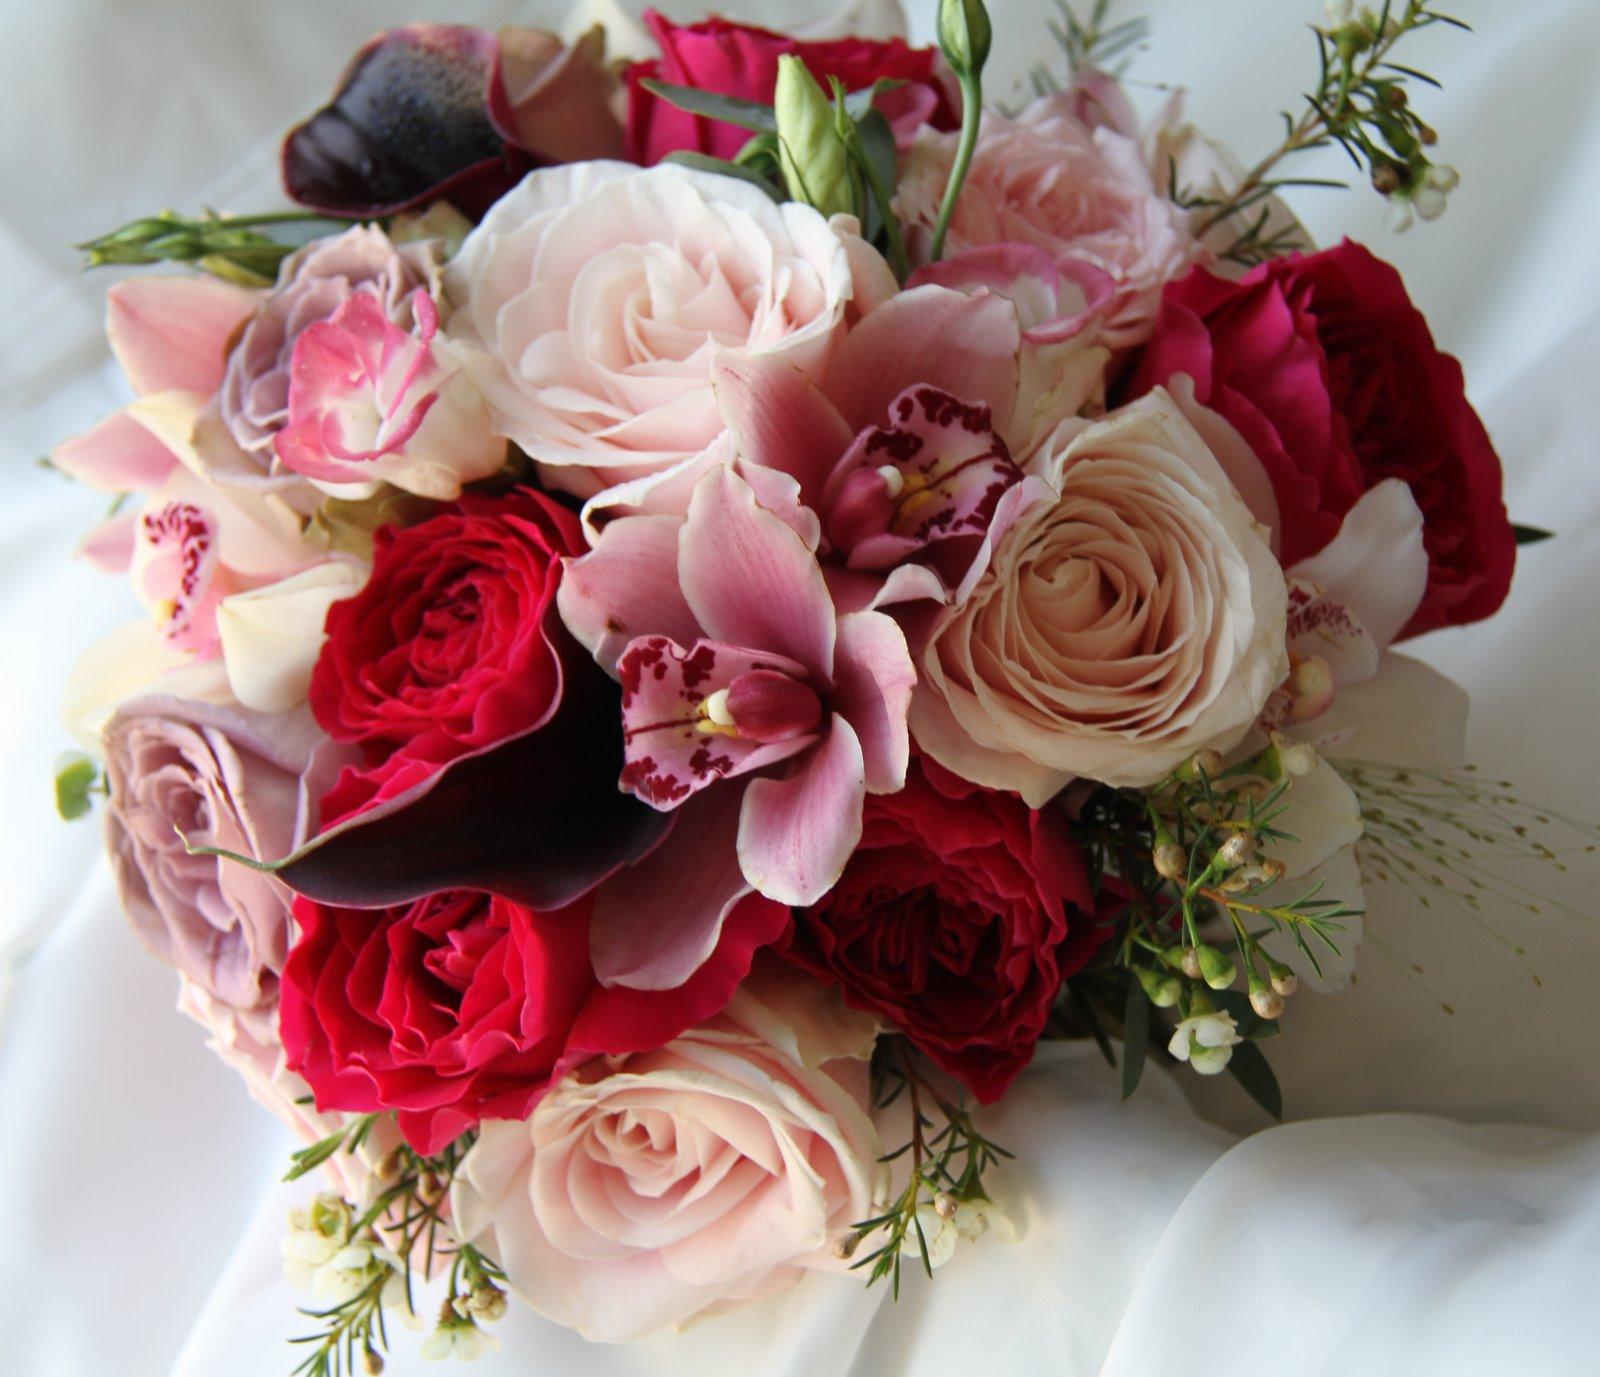 Wedding Flowers Lancashire: The Flower Magician: Beautiful Late Summer Wedding Bouquet